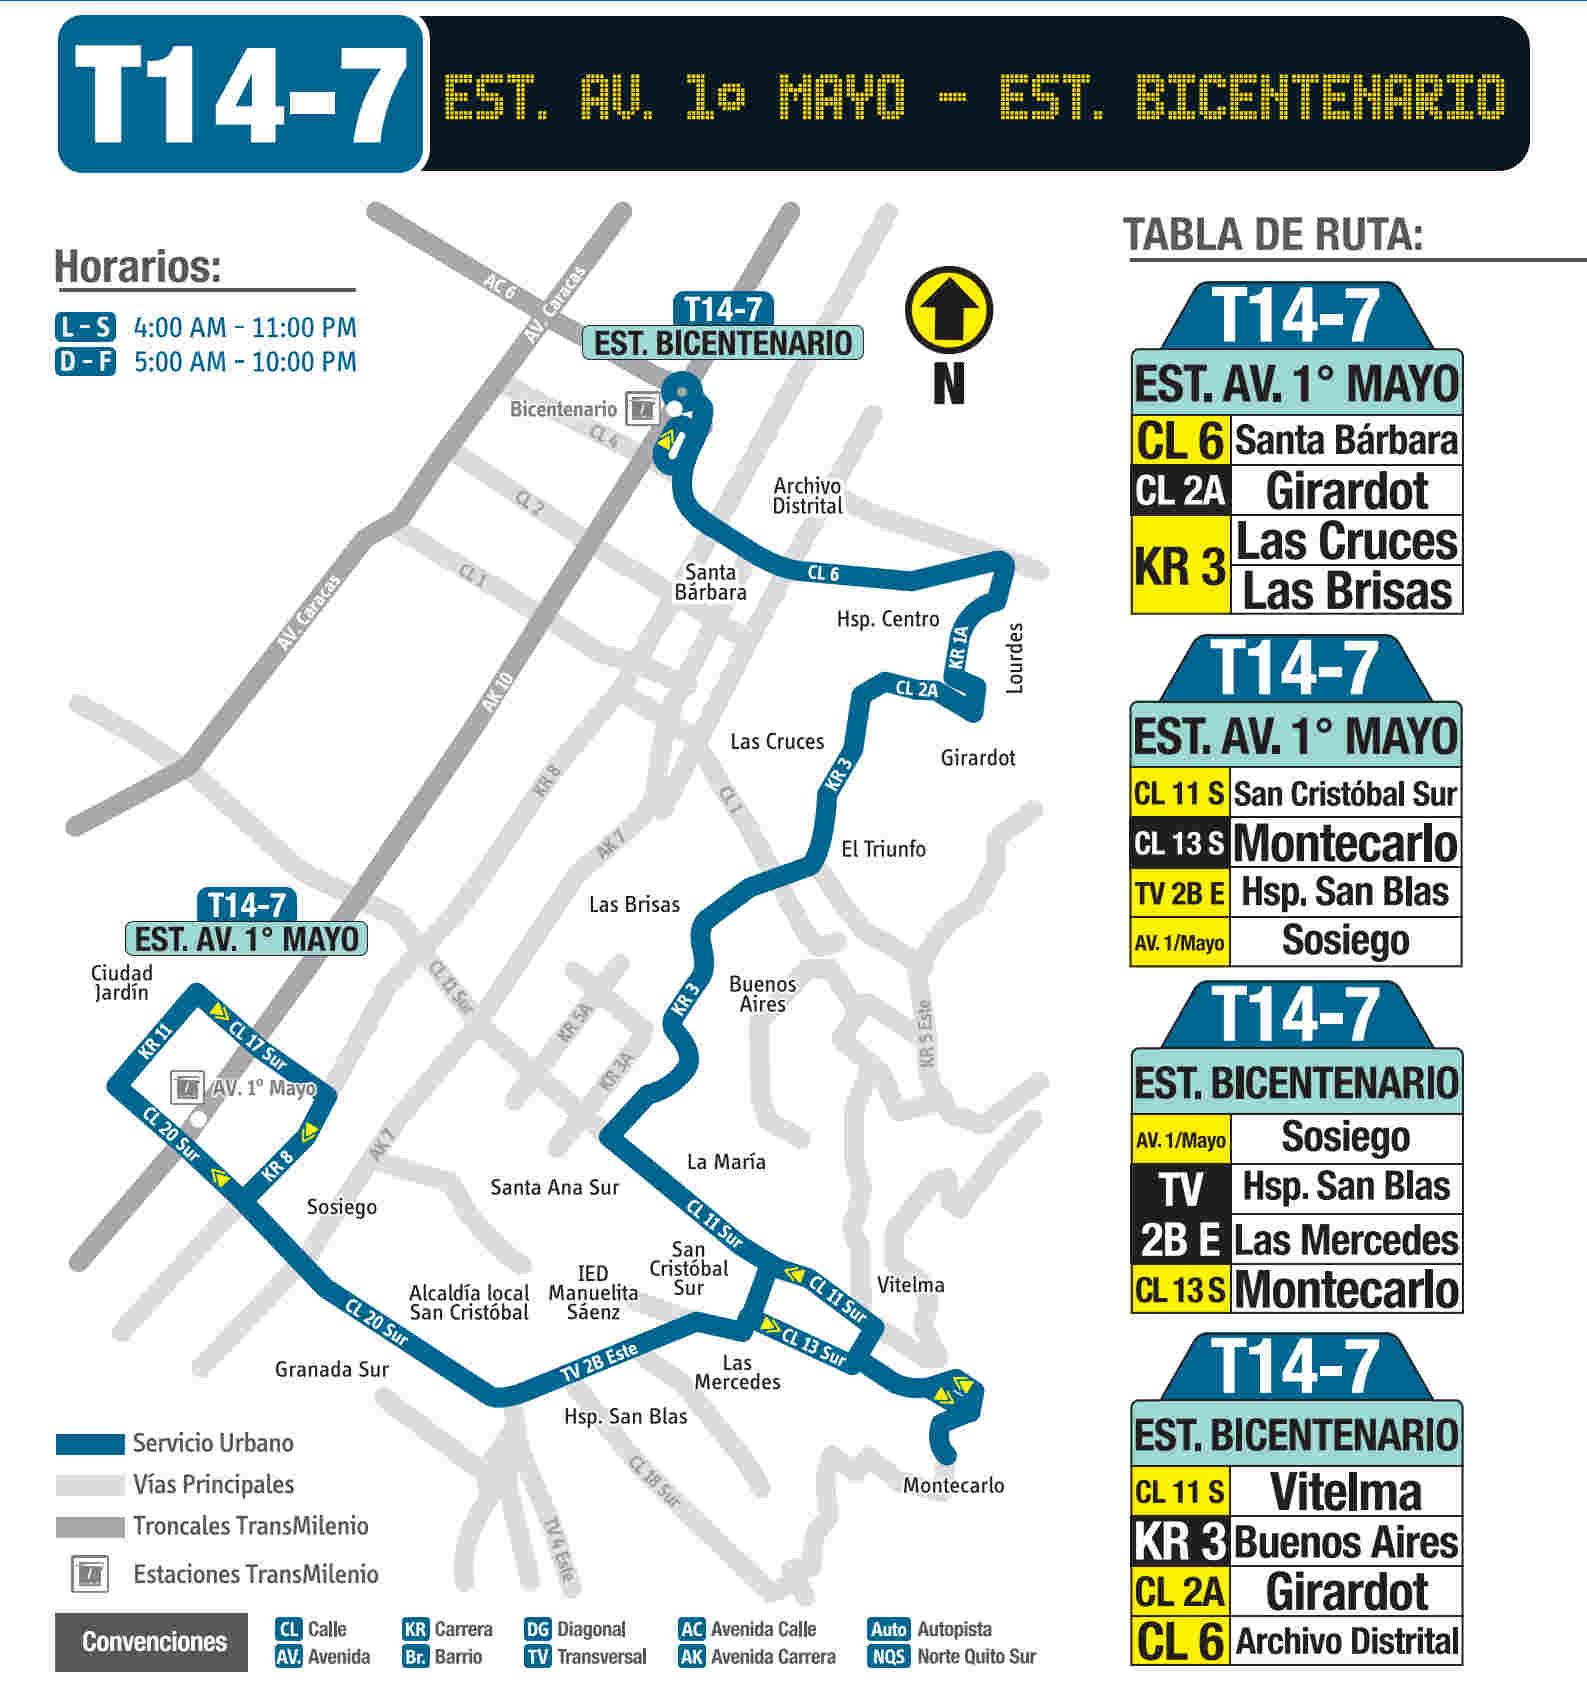 T14-7 Estación Bicentenario - Estación Avenida 1 Mayo, mapa bus urbano Bogotá